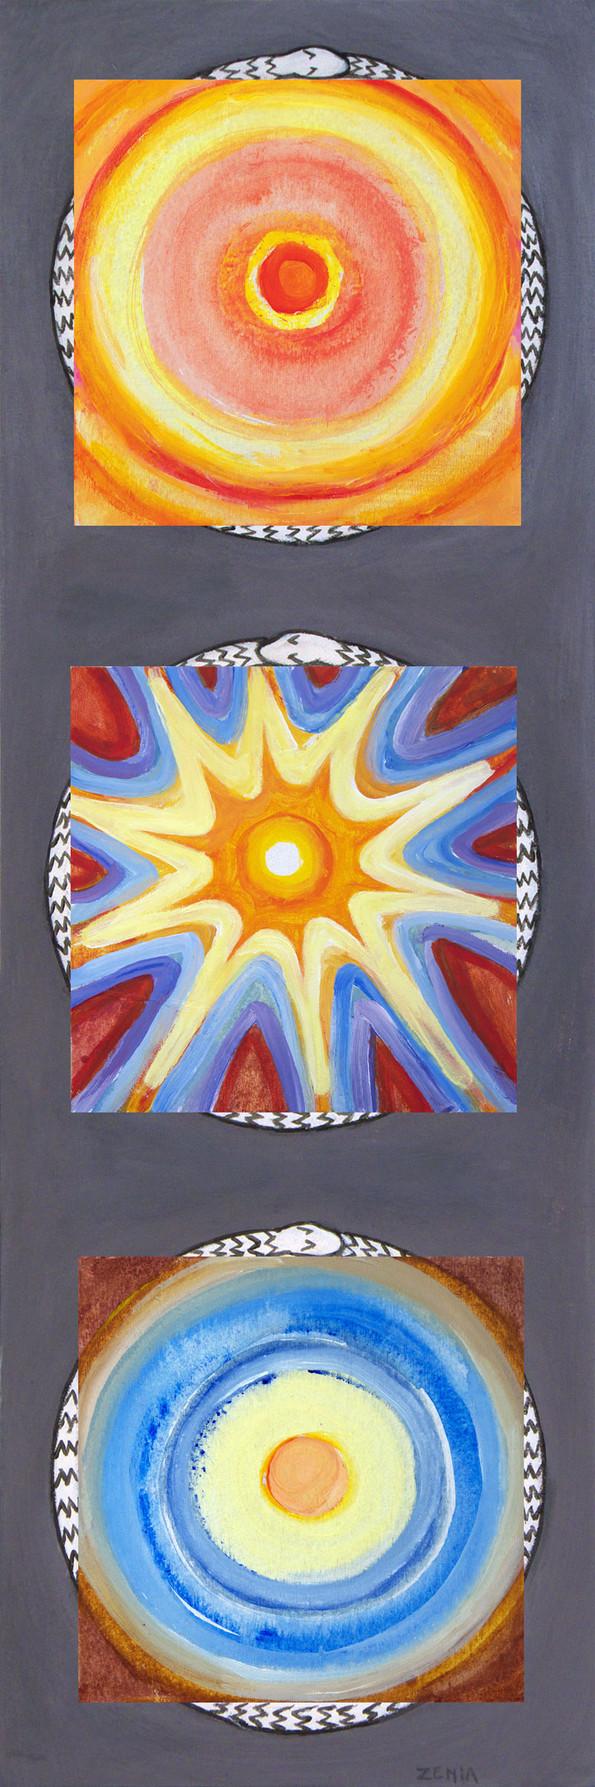 bliss-healing-peace, 26x78 cm